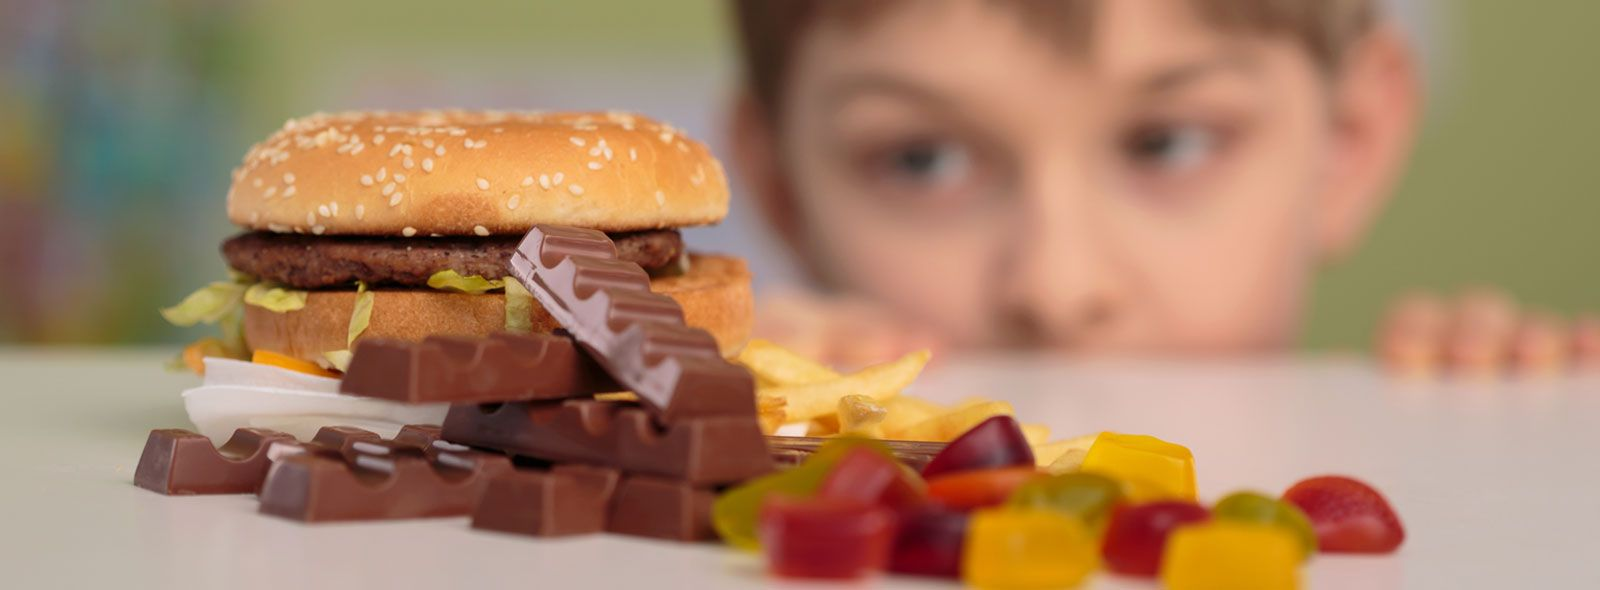 Obesità infantile in italia